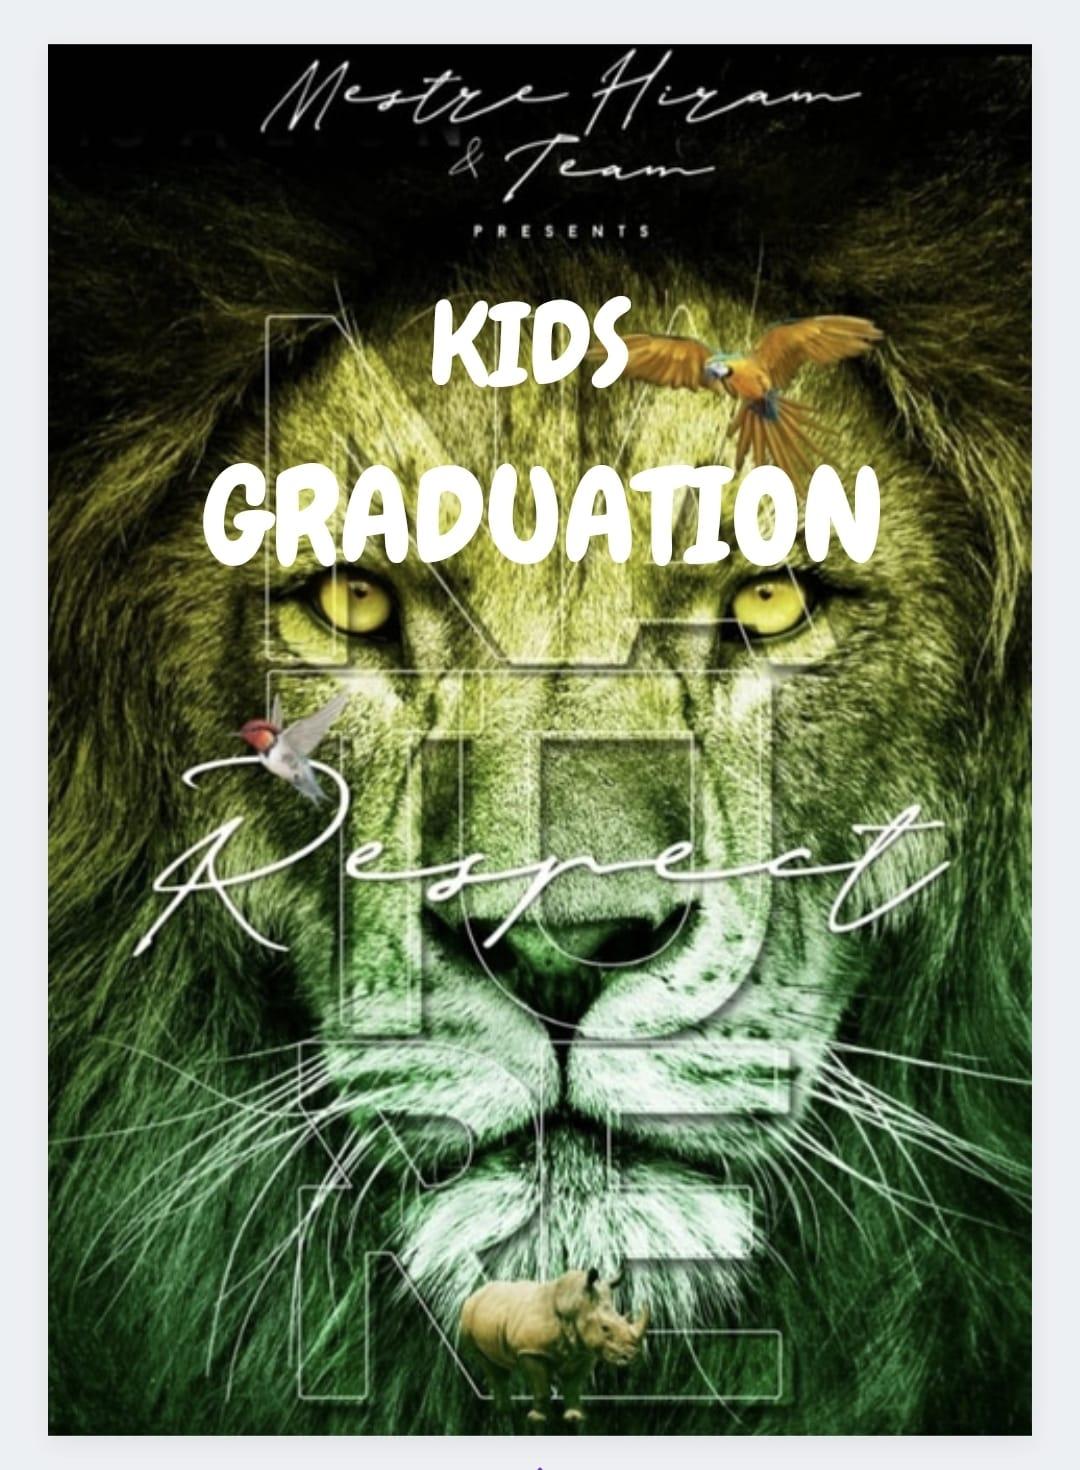 kids graduation image